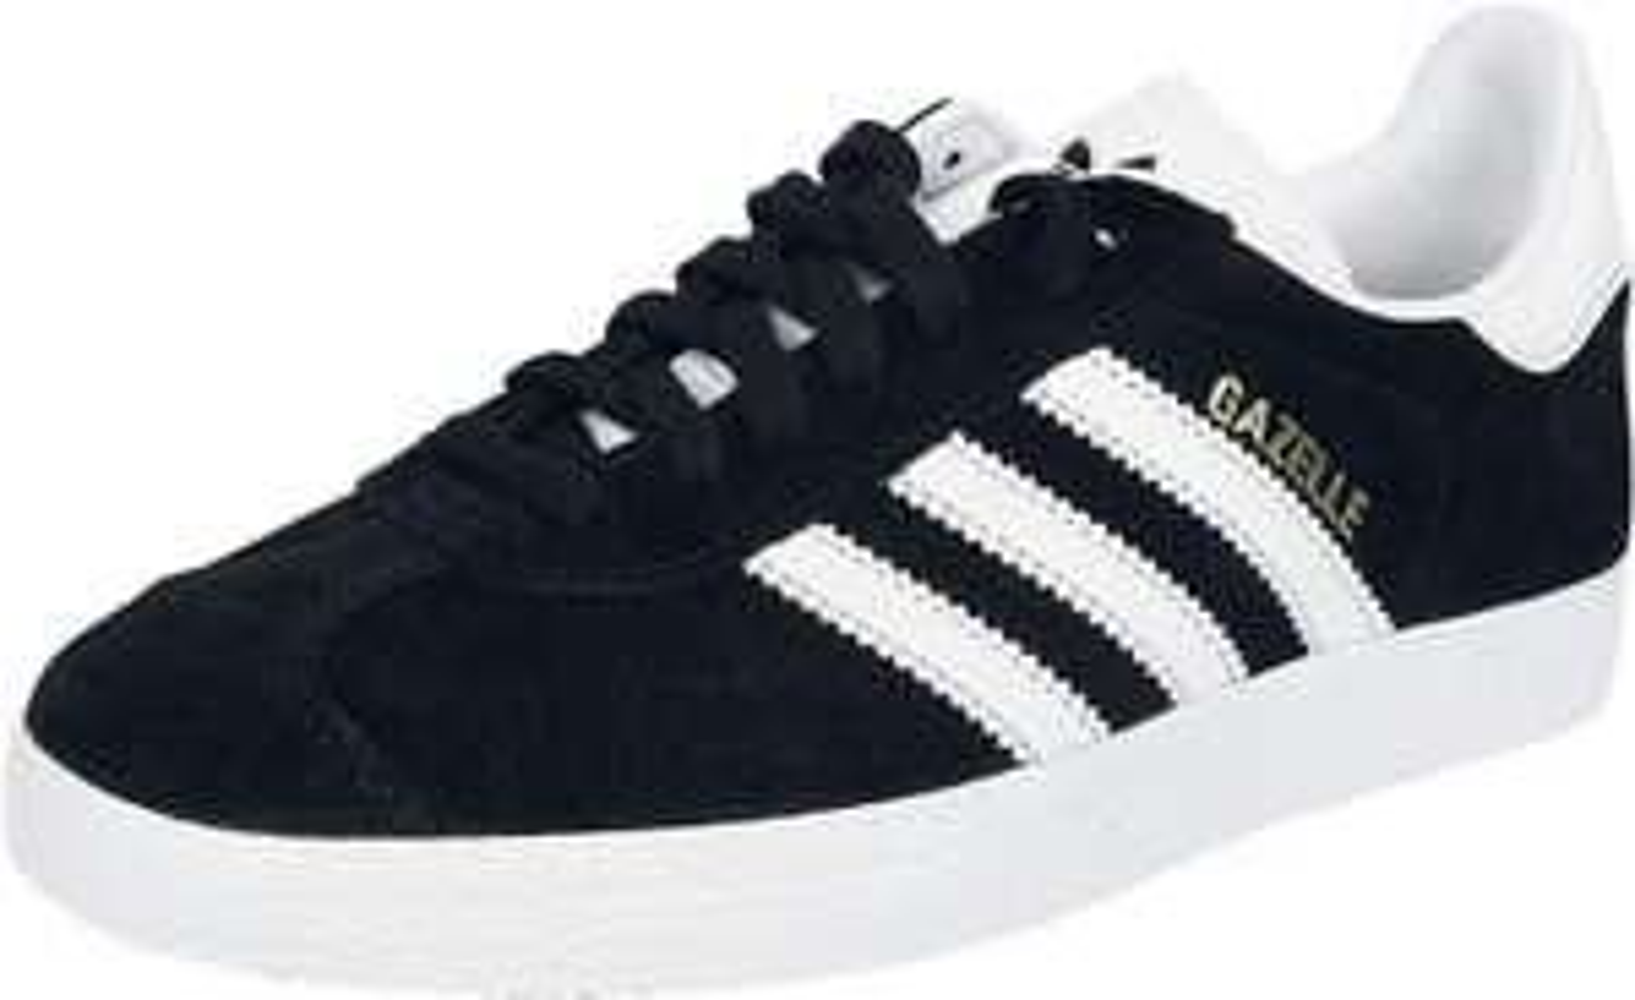 Adidas Gazelle Men's Shoes Various Sizes - £32 / £28.80 Students @ Amazon